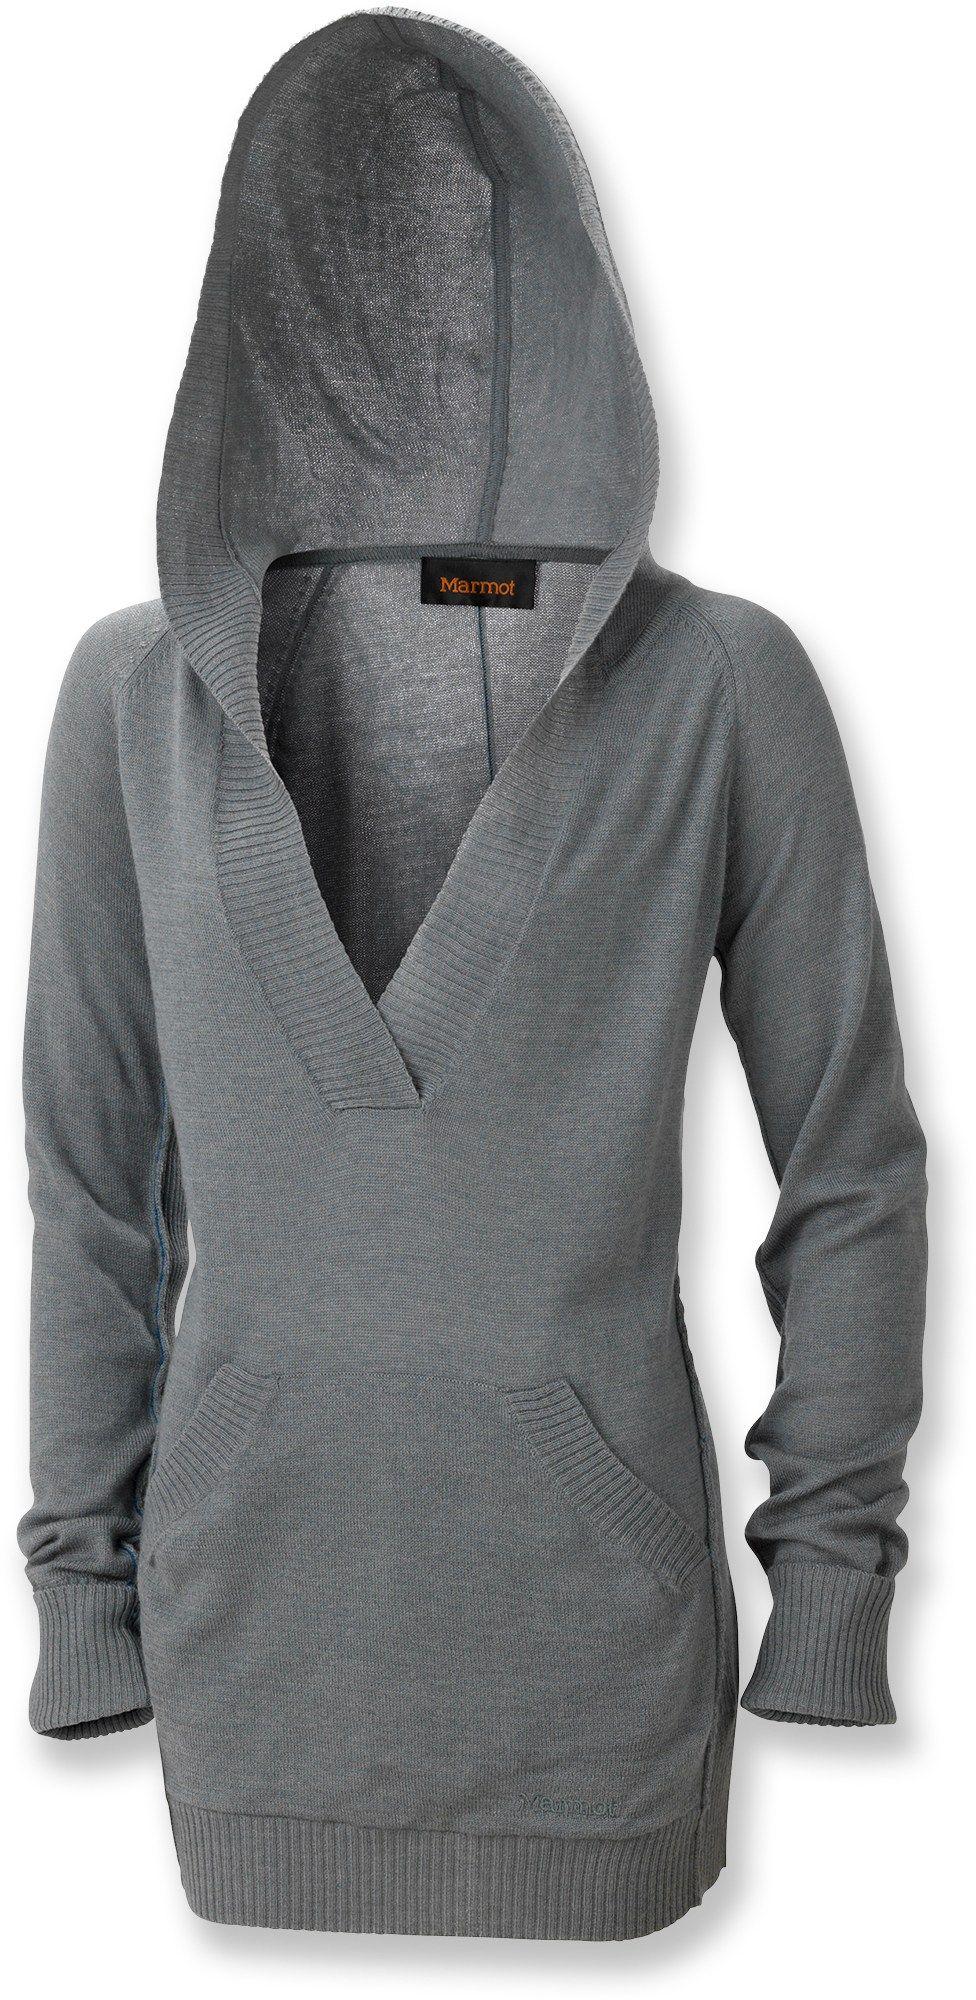 Marmot Madison Hooded Sweater - Women's - REI | Panache ...